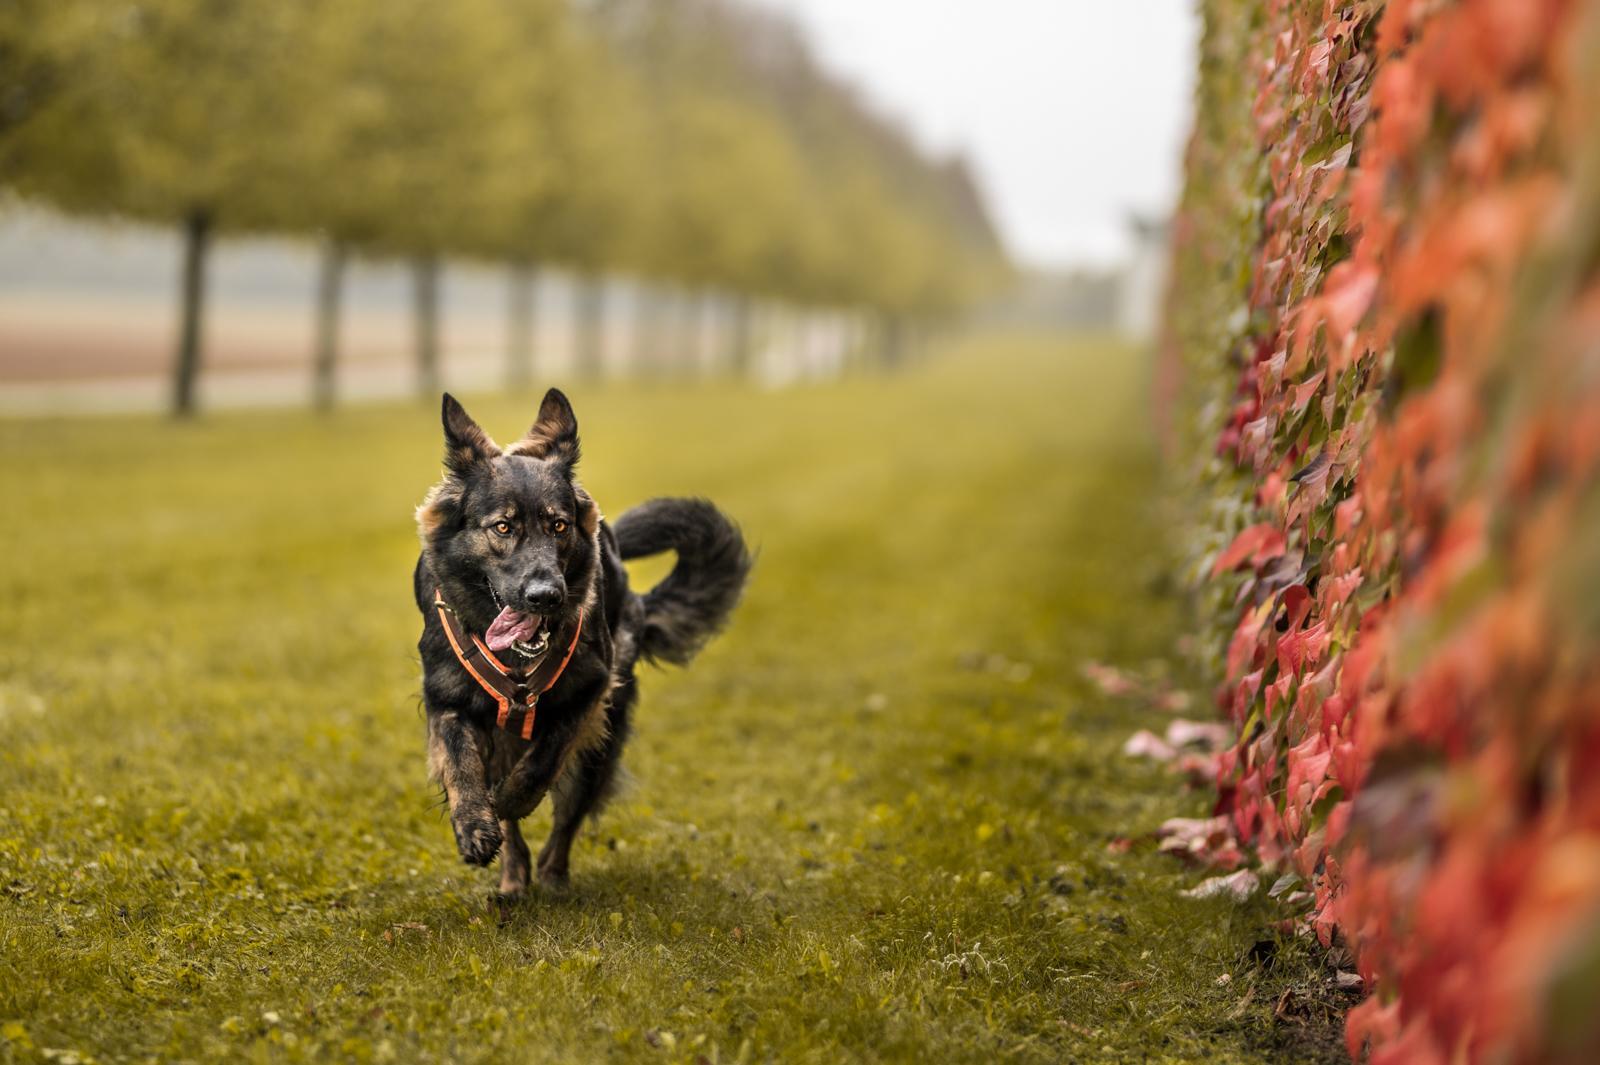 Tierfotograf-Labrador-Sven's Bildwerke-Hund-Hundefotografie10